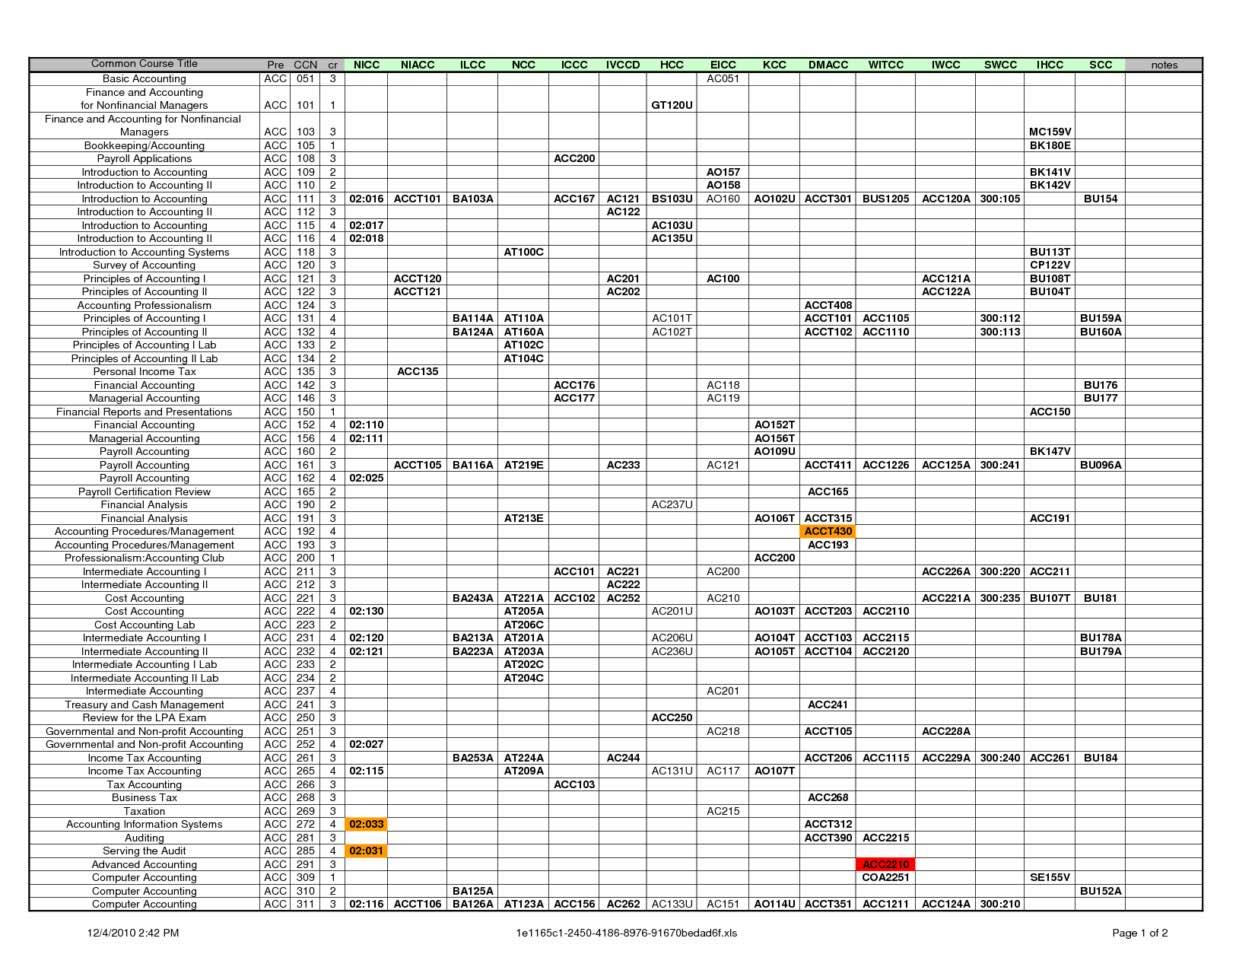 Self Employed Spreadsheet Template On Spreadsheet App Household with Self Employed Spreadsheet Templates